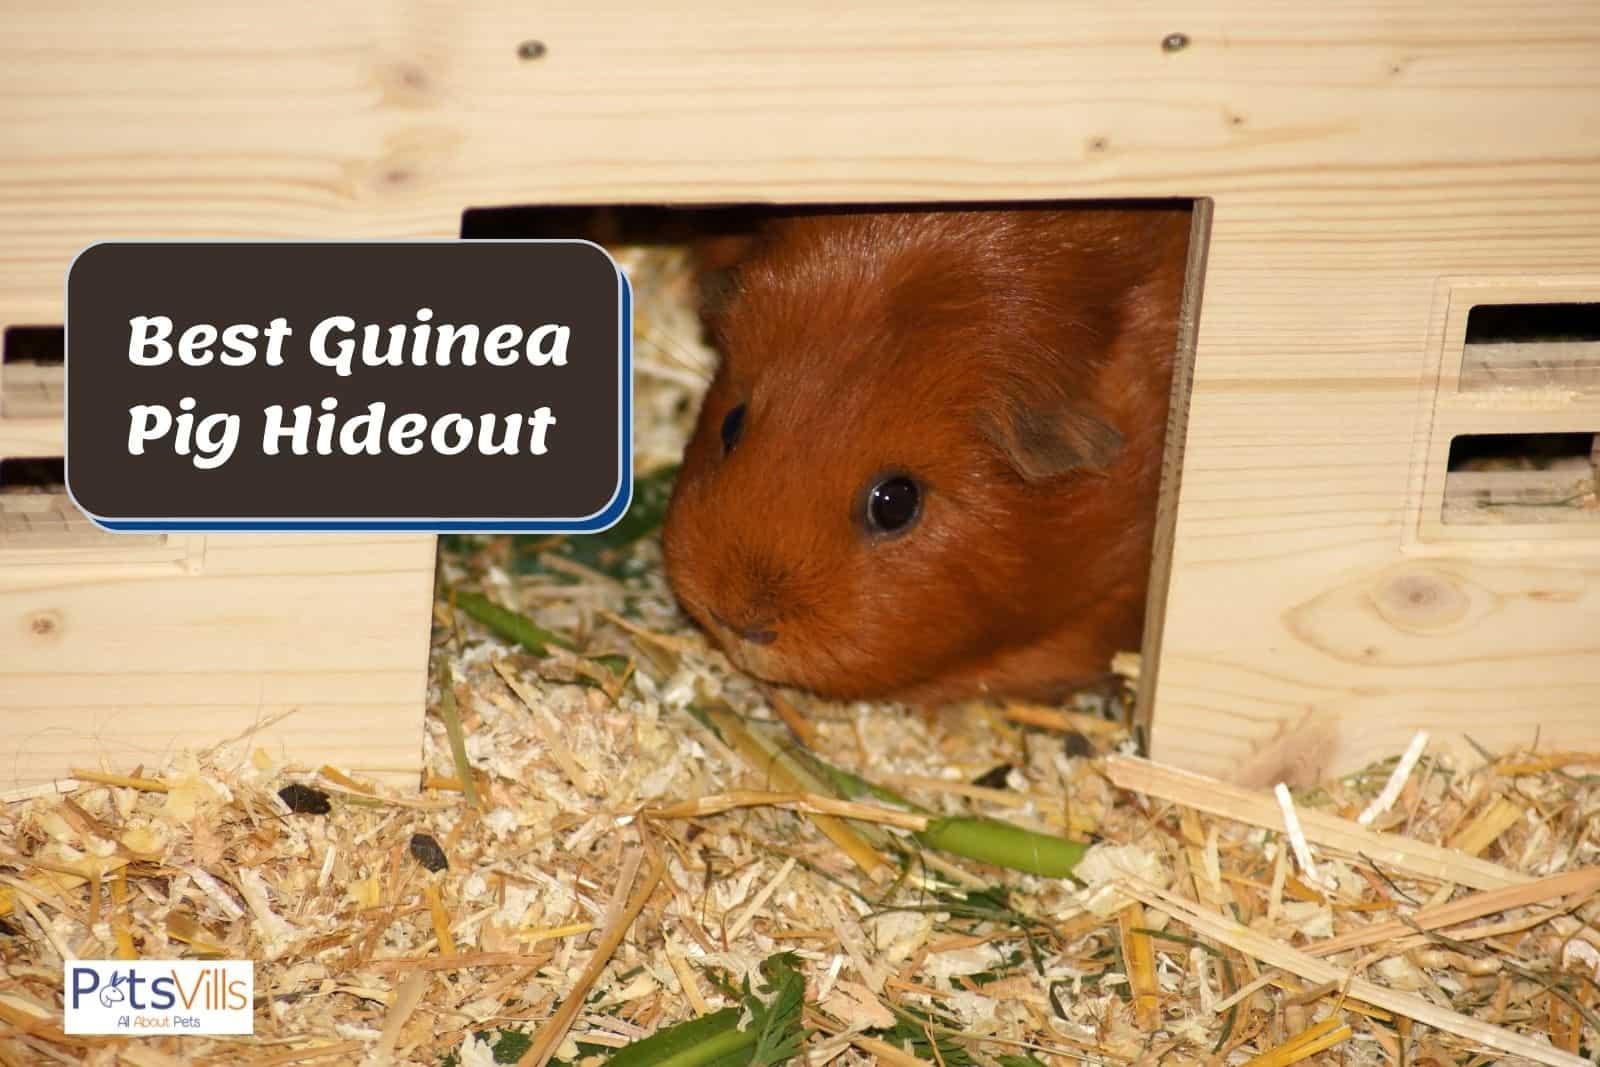 cavy inside his best guinea pig hideout